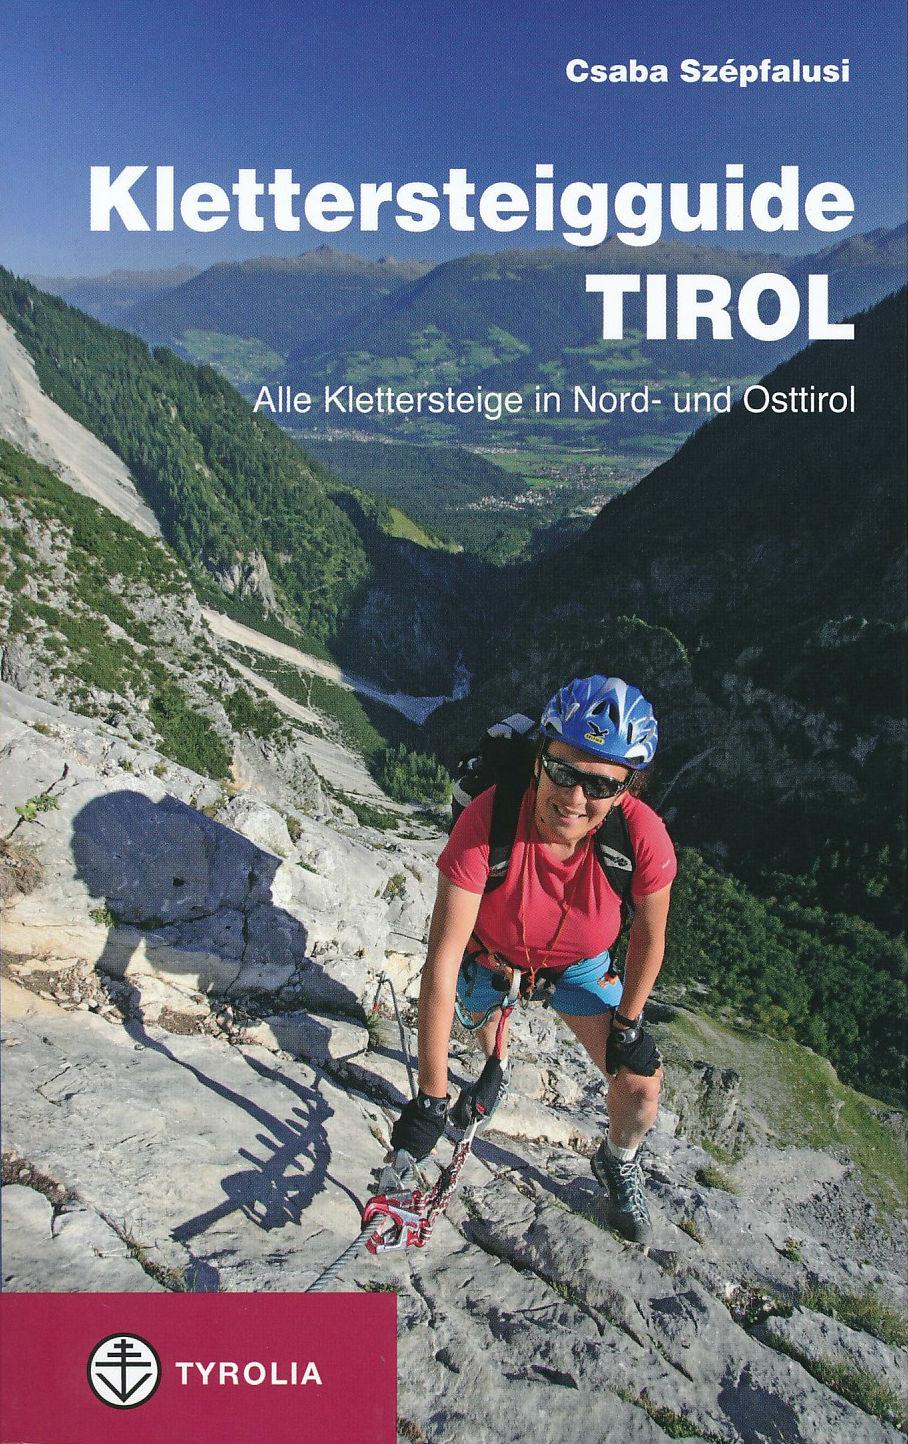 Klimgids Klettersteigguide Tirol   Tyrolia   Csaba Szepfalusi